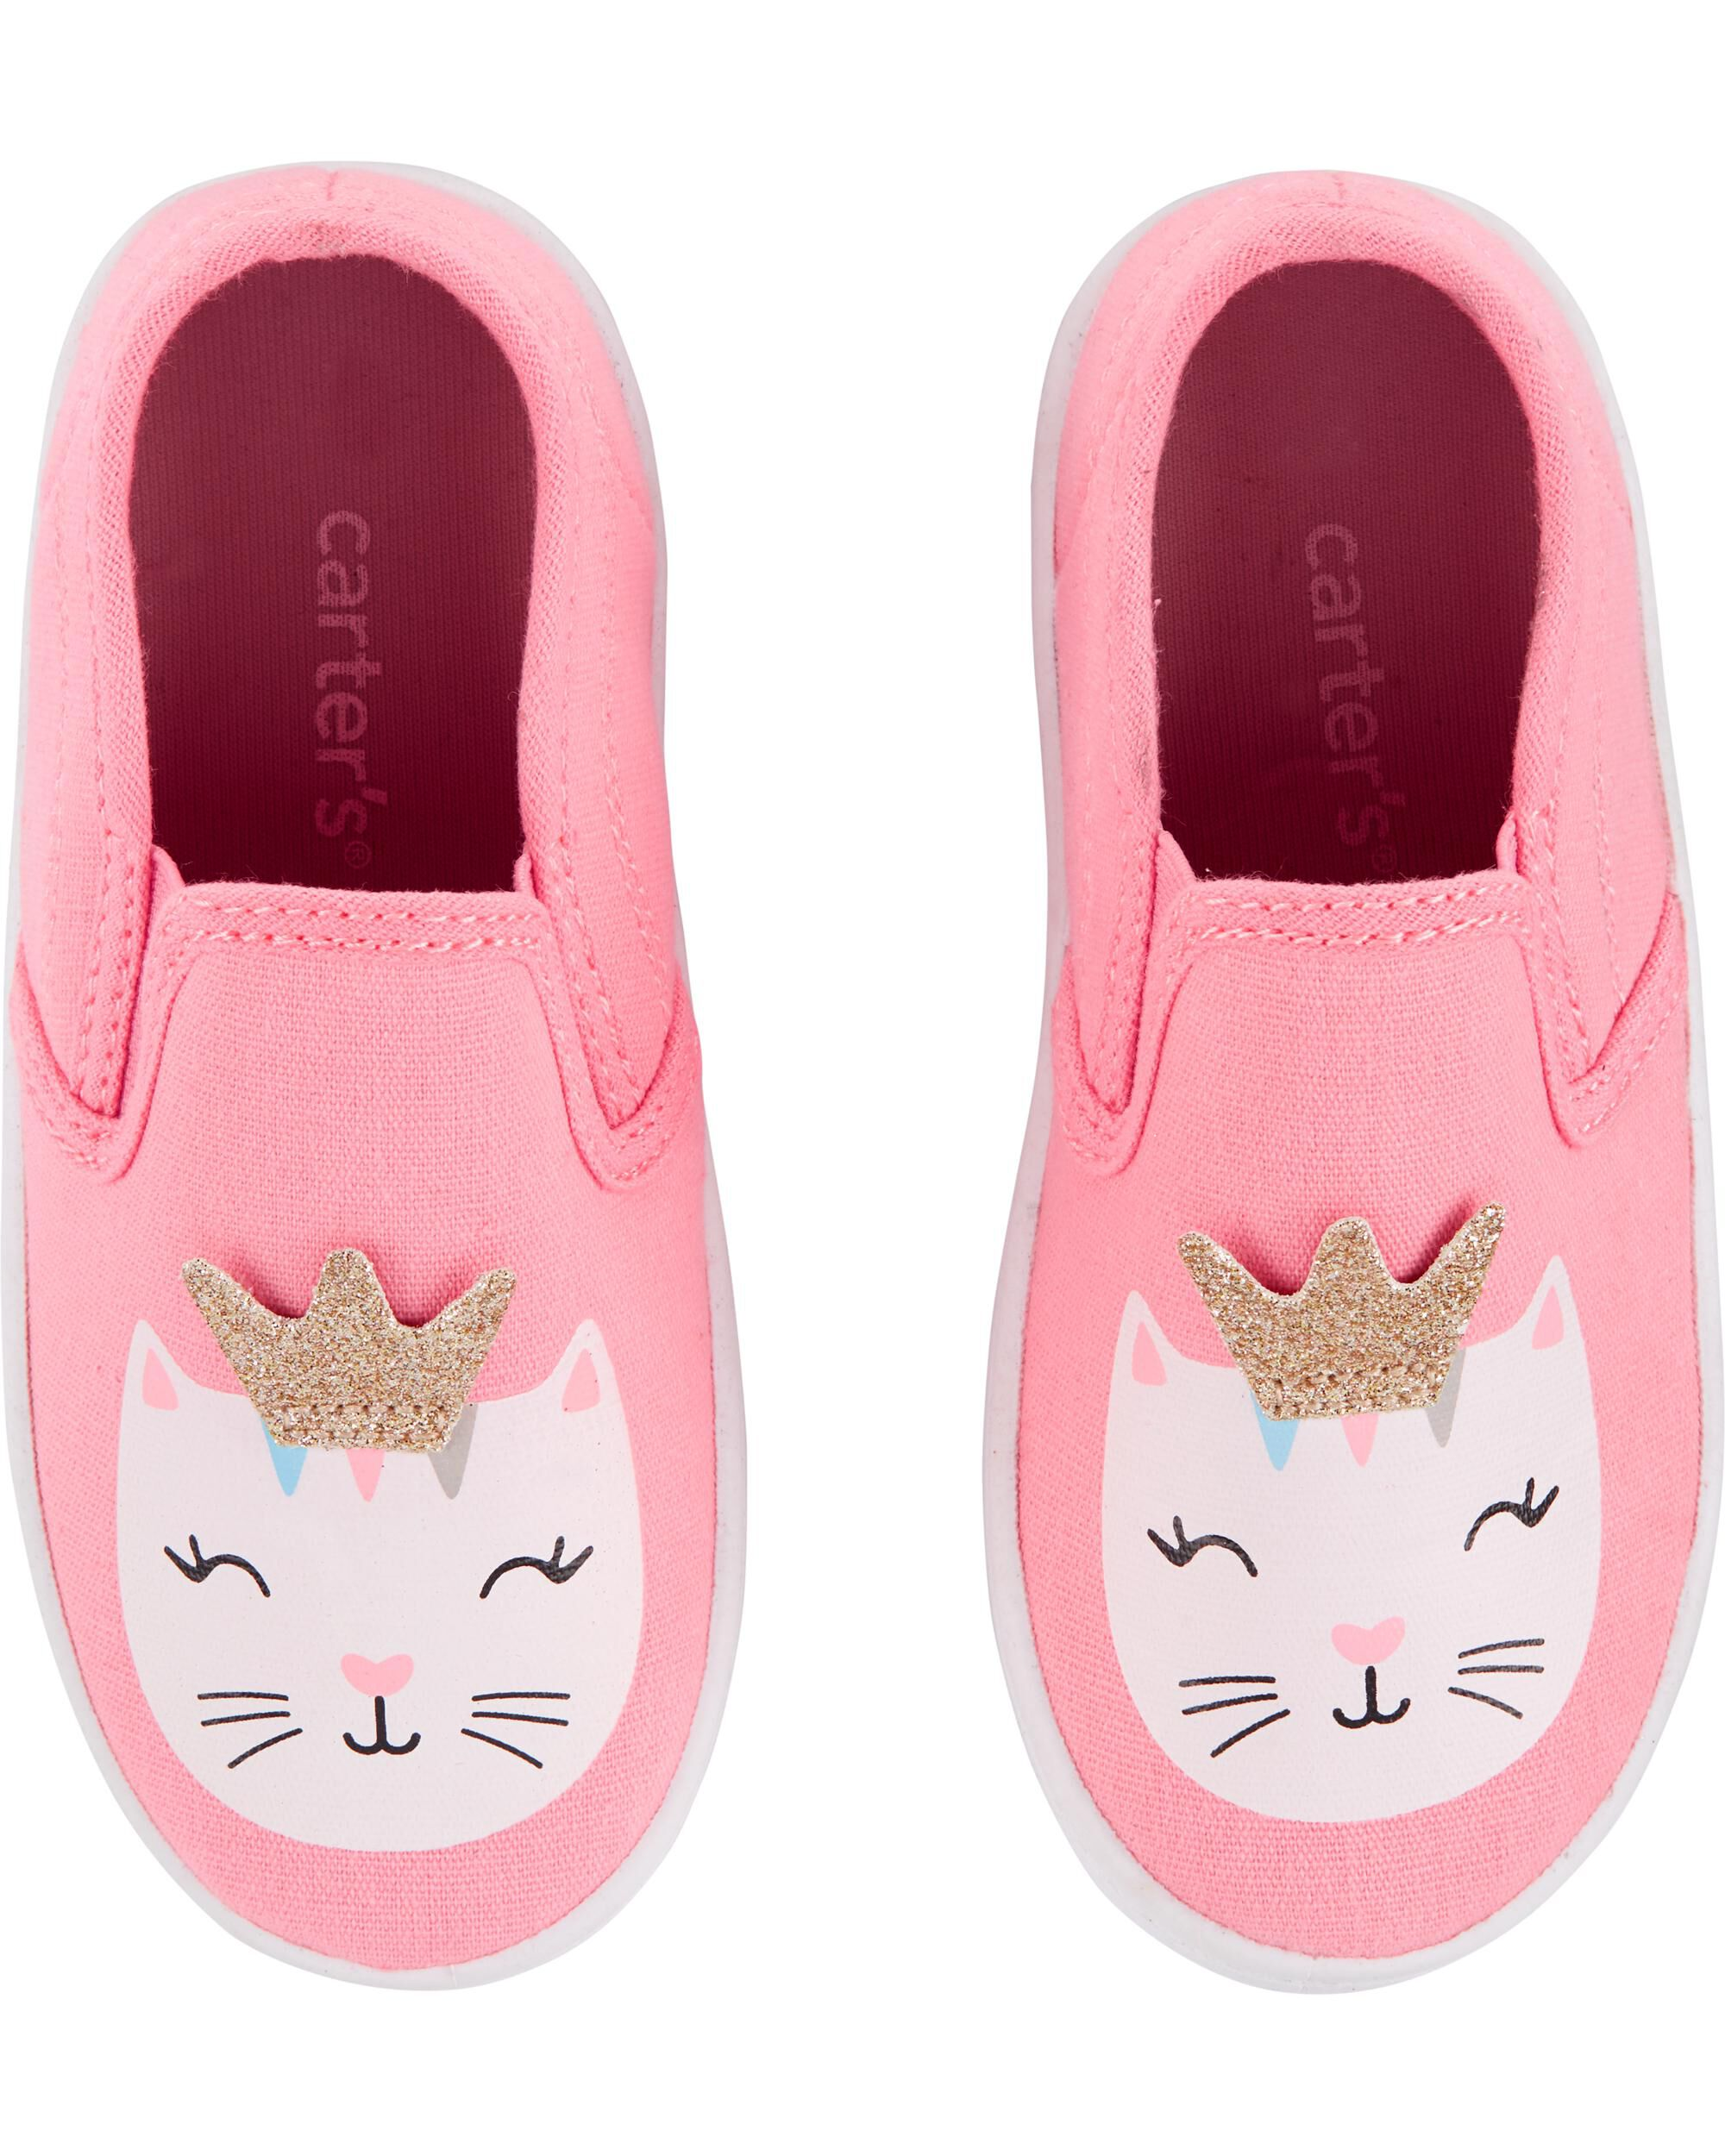 Oshkoshbgosh Carters Glitter Cat Casual Sneakers